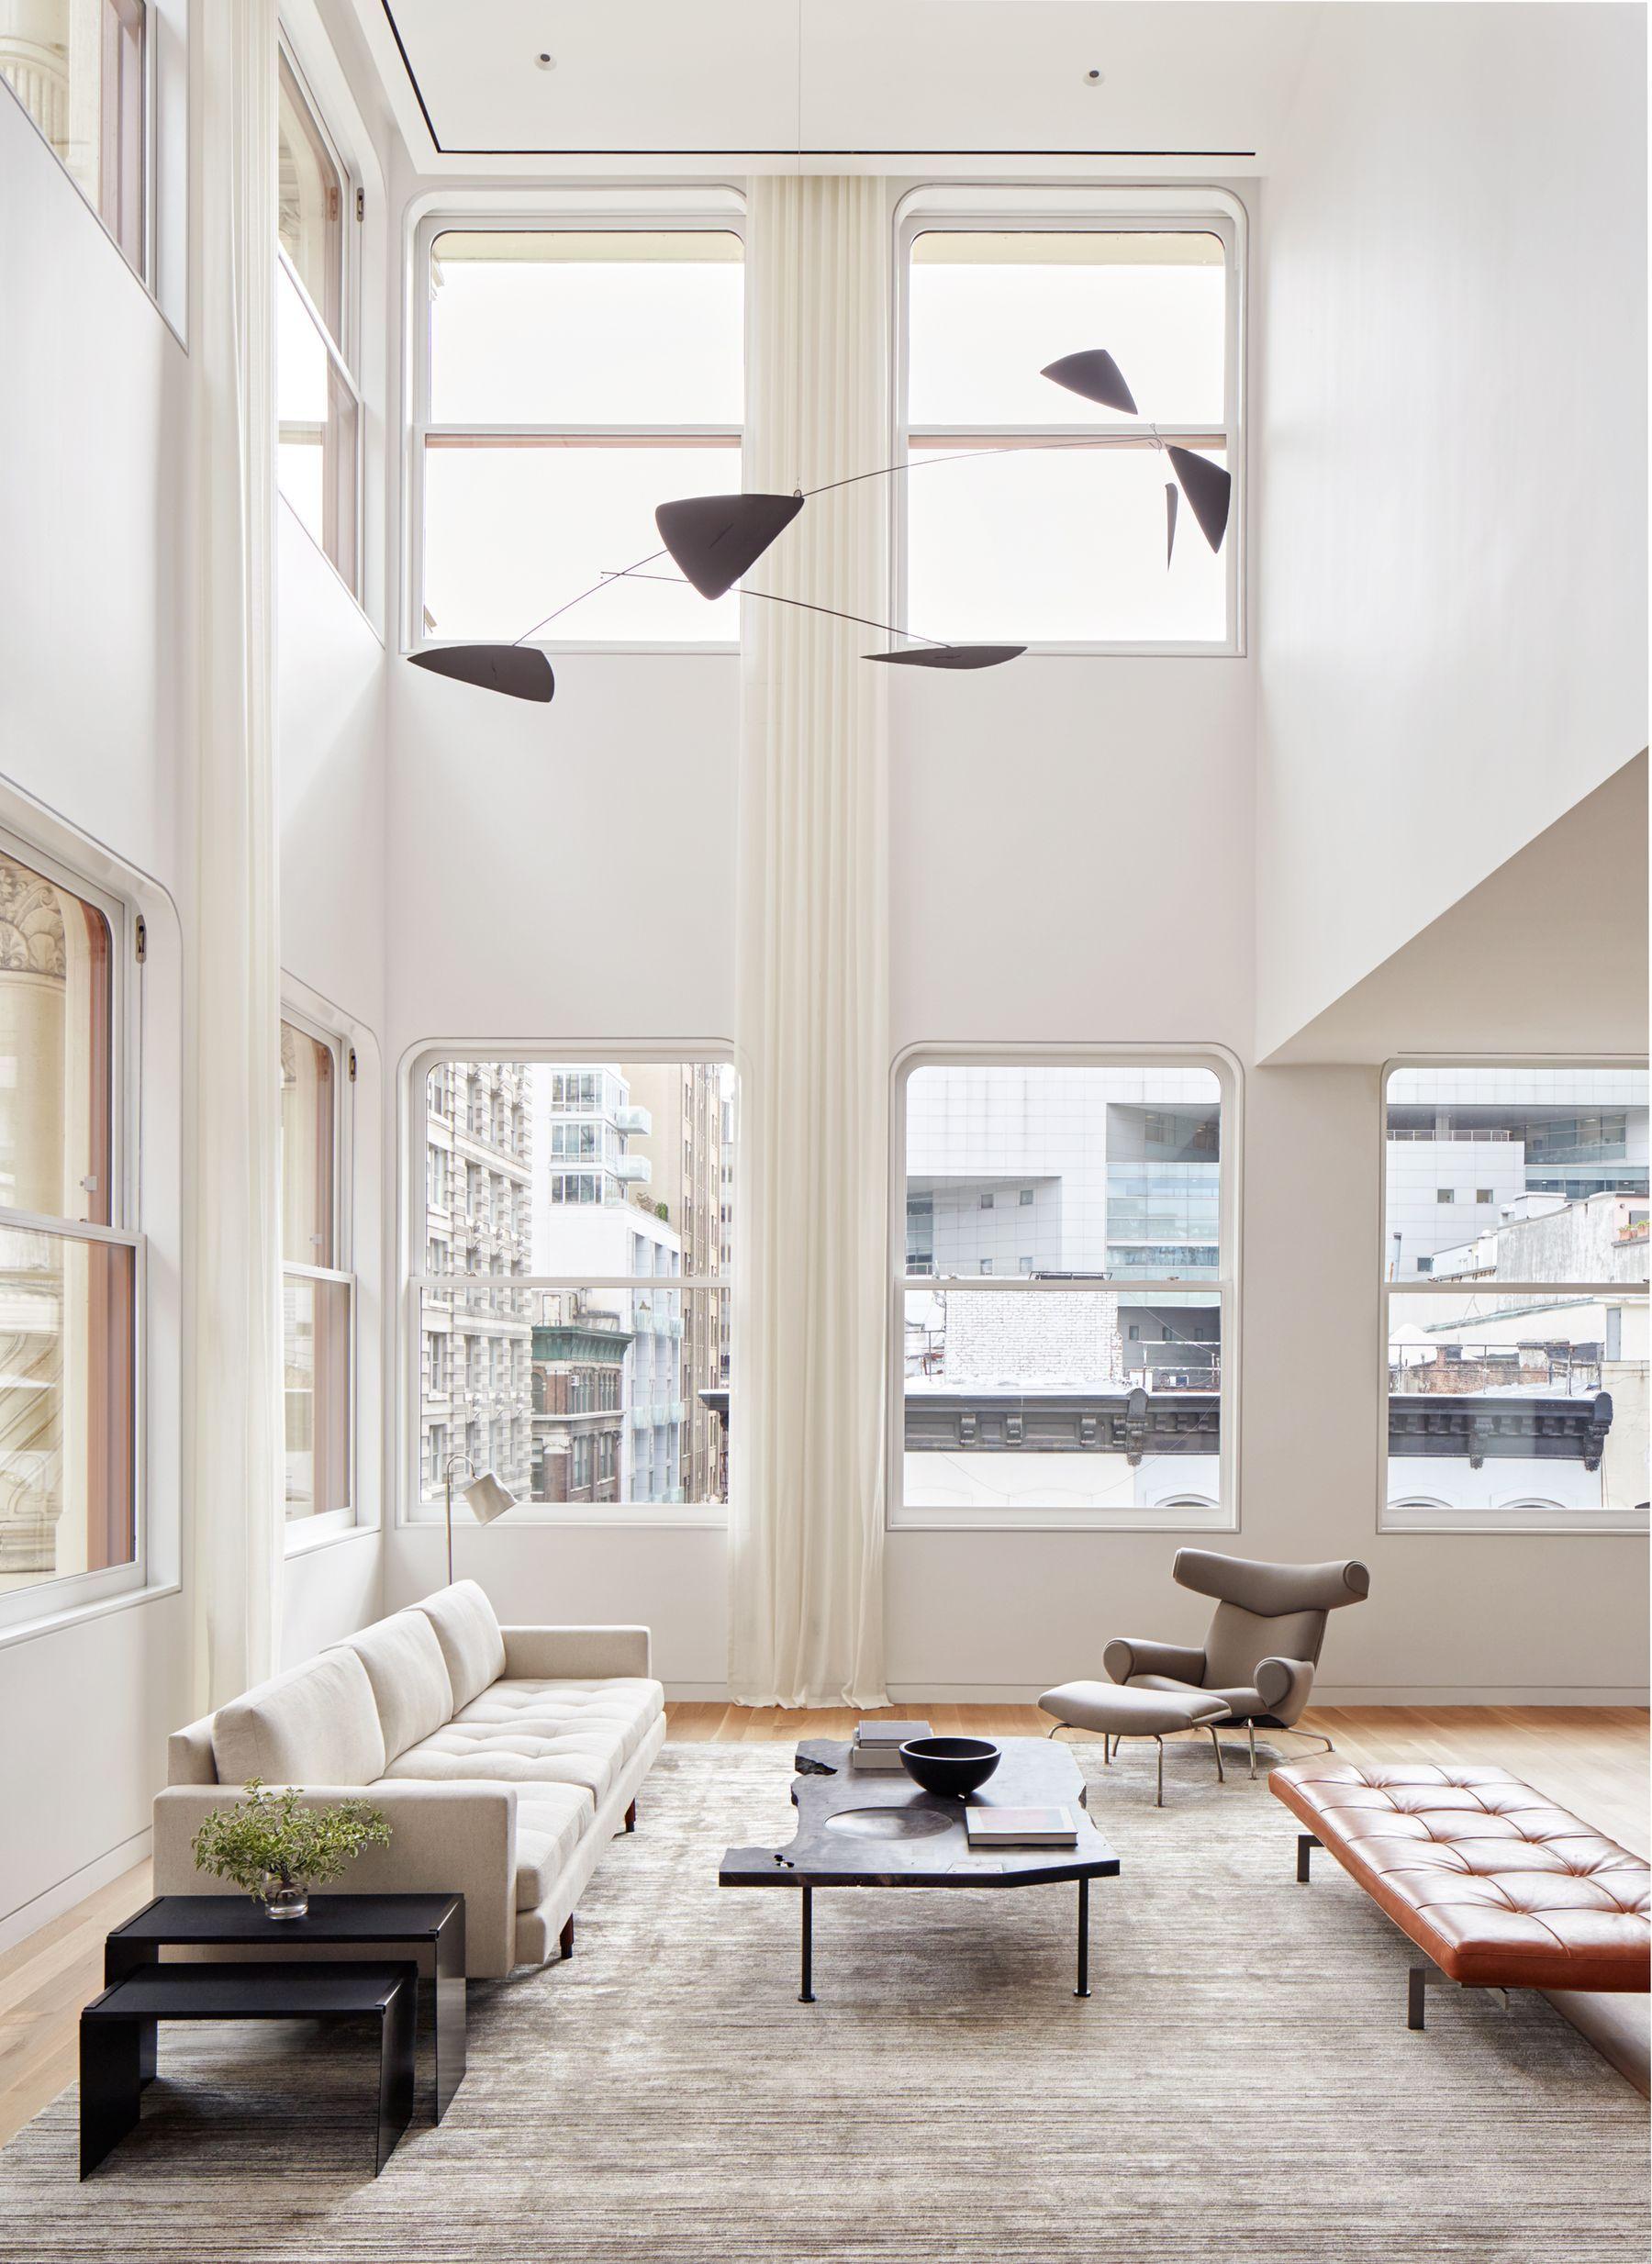 shigeru ban's cast iron house unveils its austere model apartment, Innenarchitektur ideen